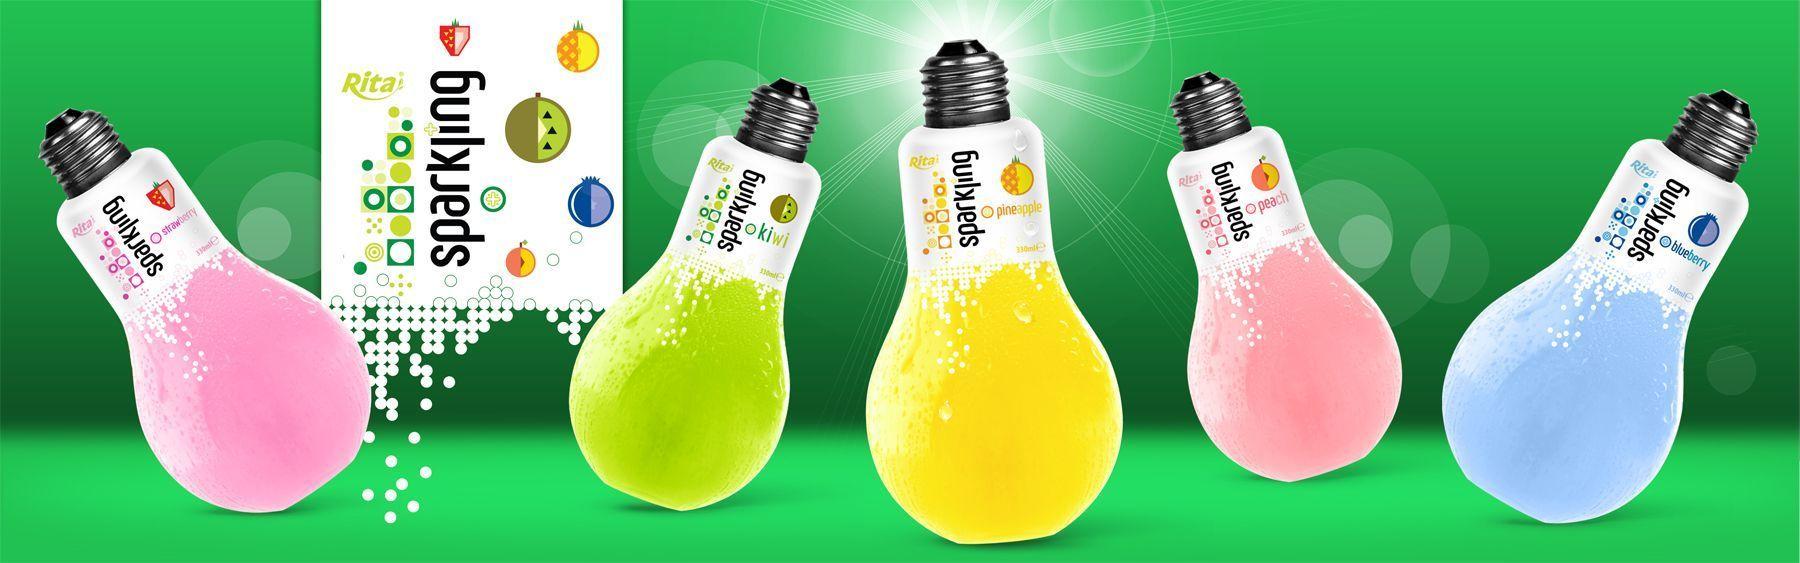 Baner-web_Sparkling-330ml-Pet-Bulb